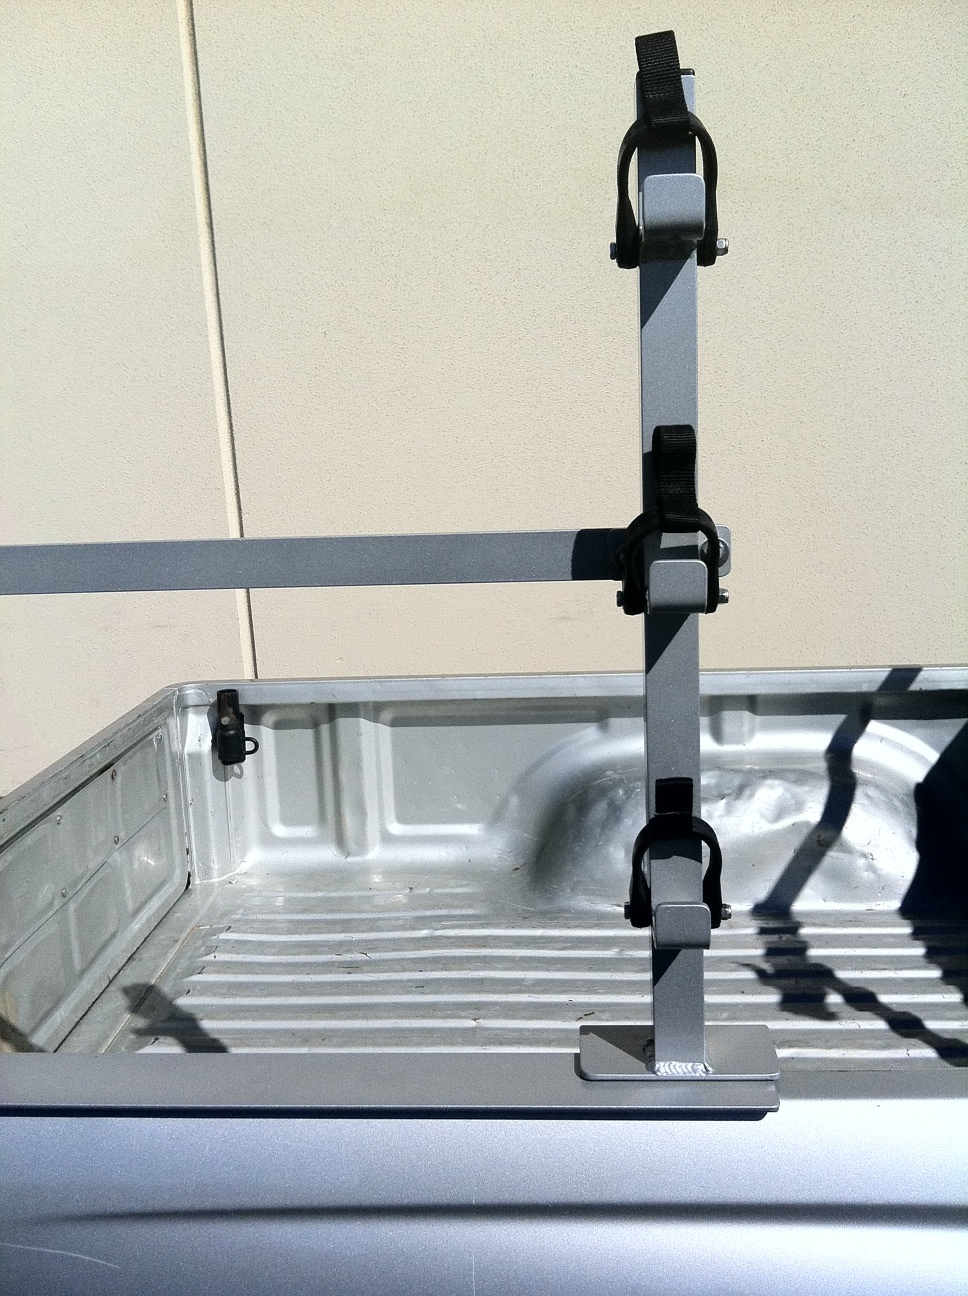 Rack-it Truck Racks: Custom Trimmer Rack Is A Handy Helper